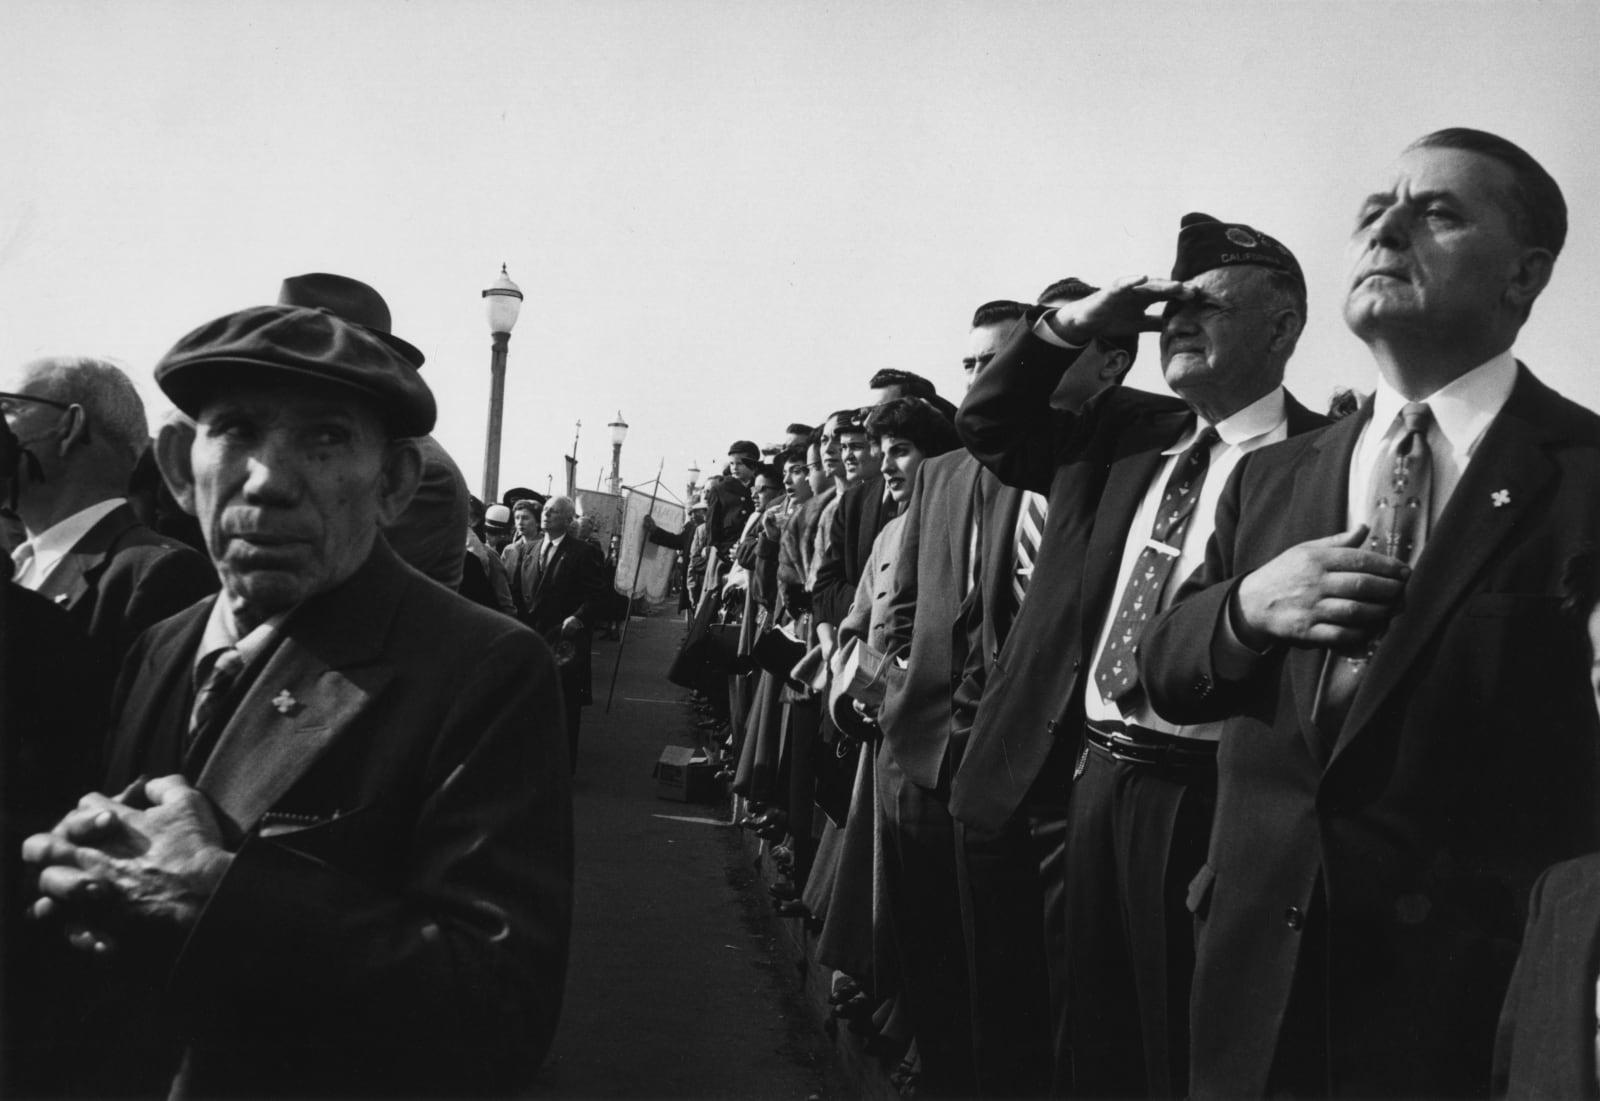 Robert Frank - Los Angeles, 1956